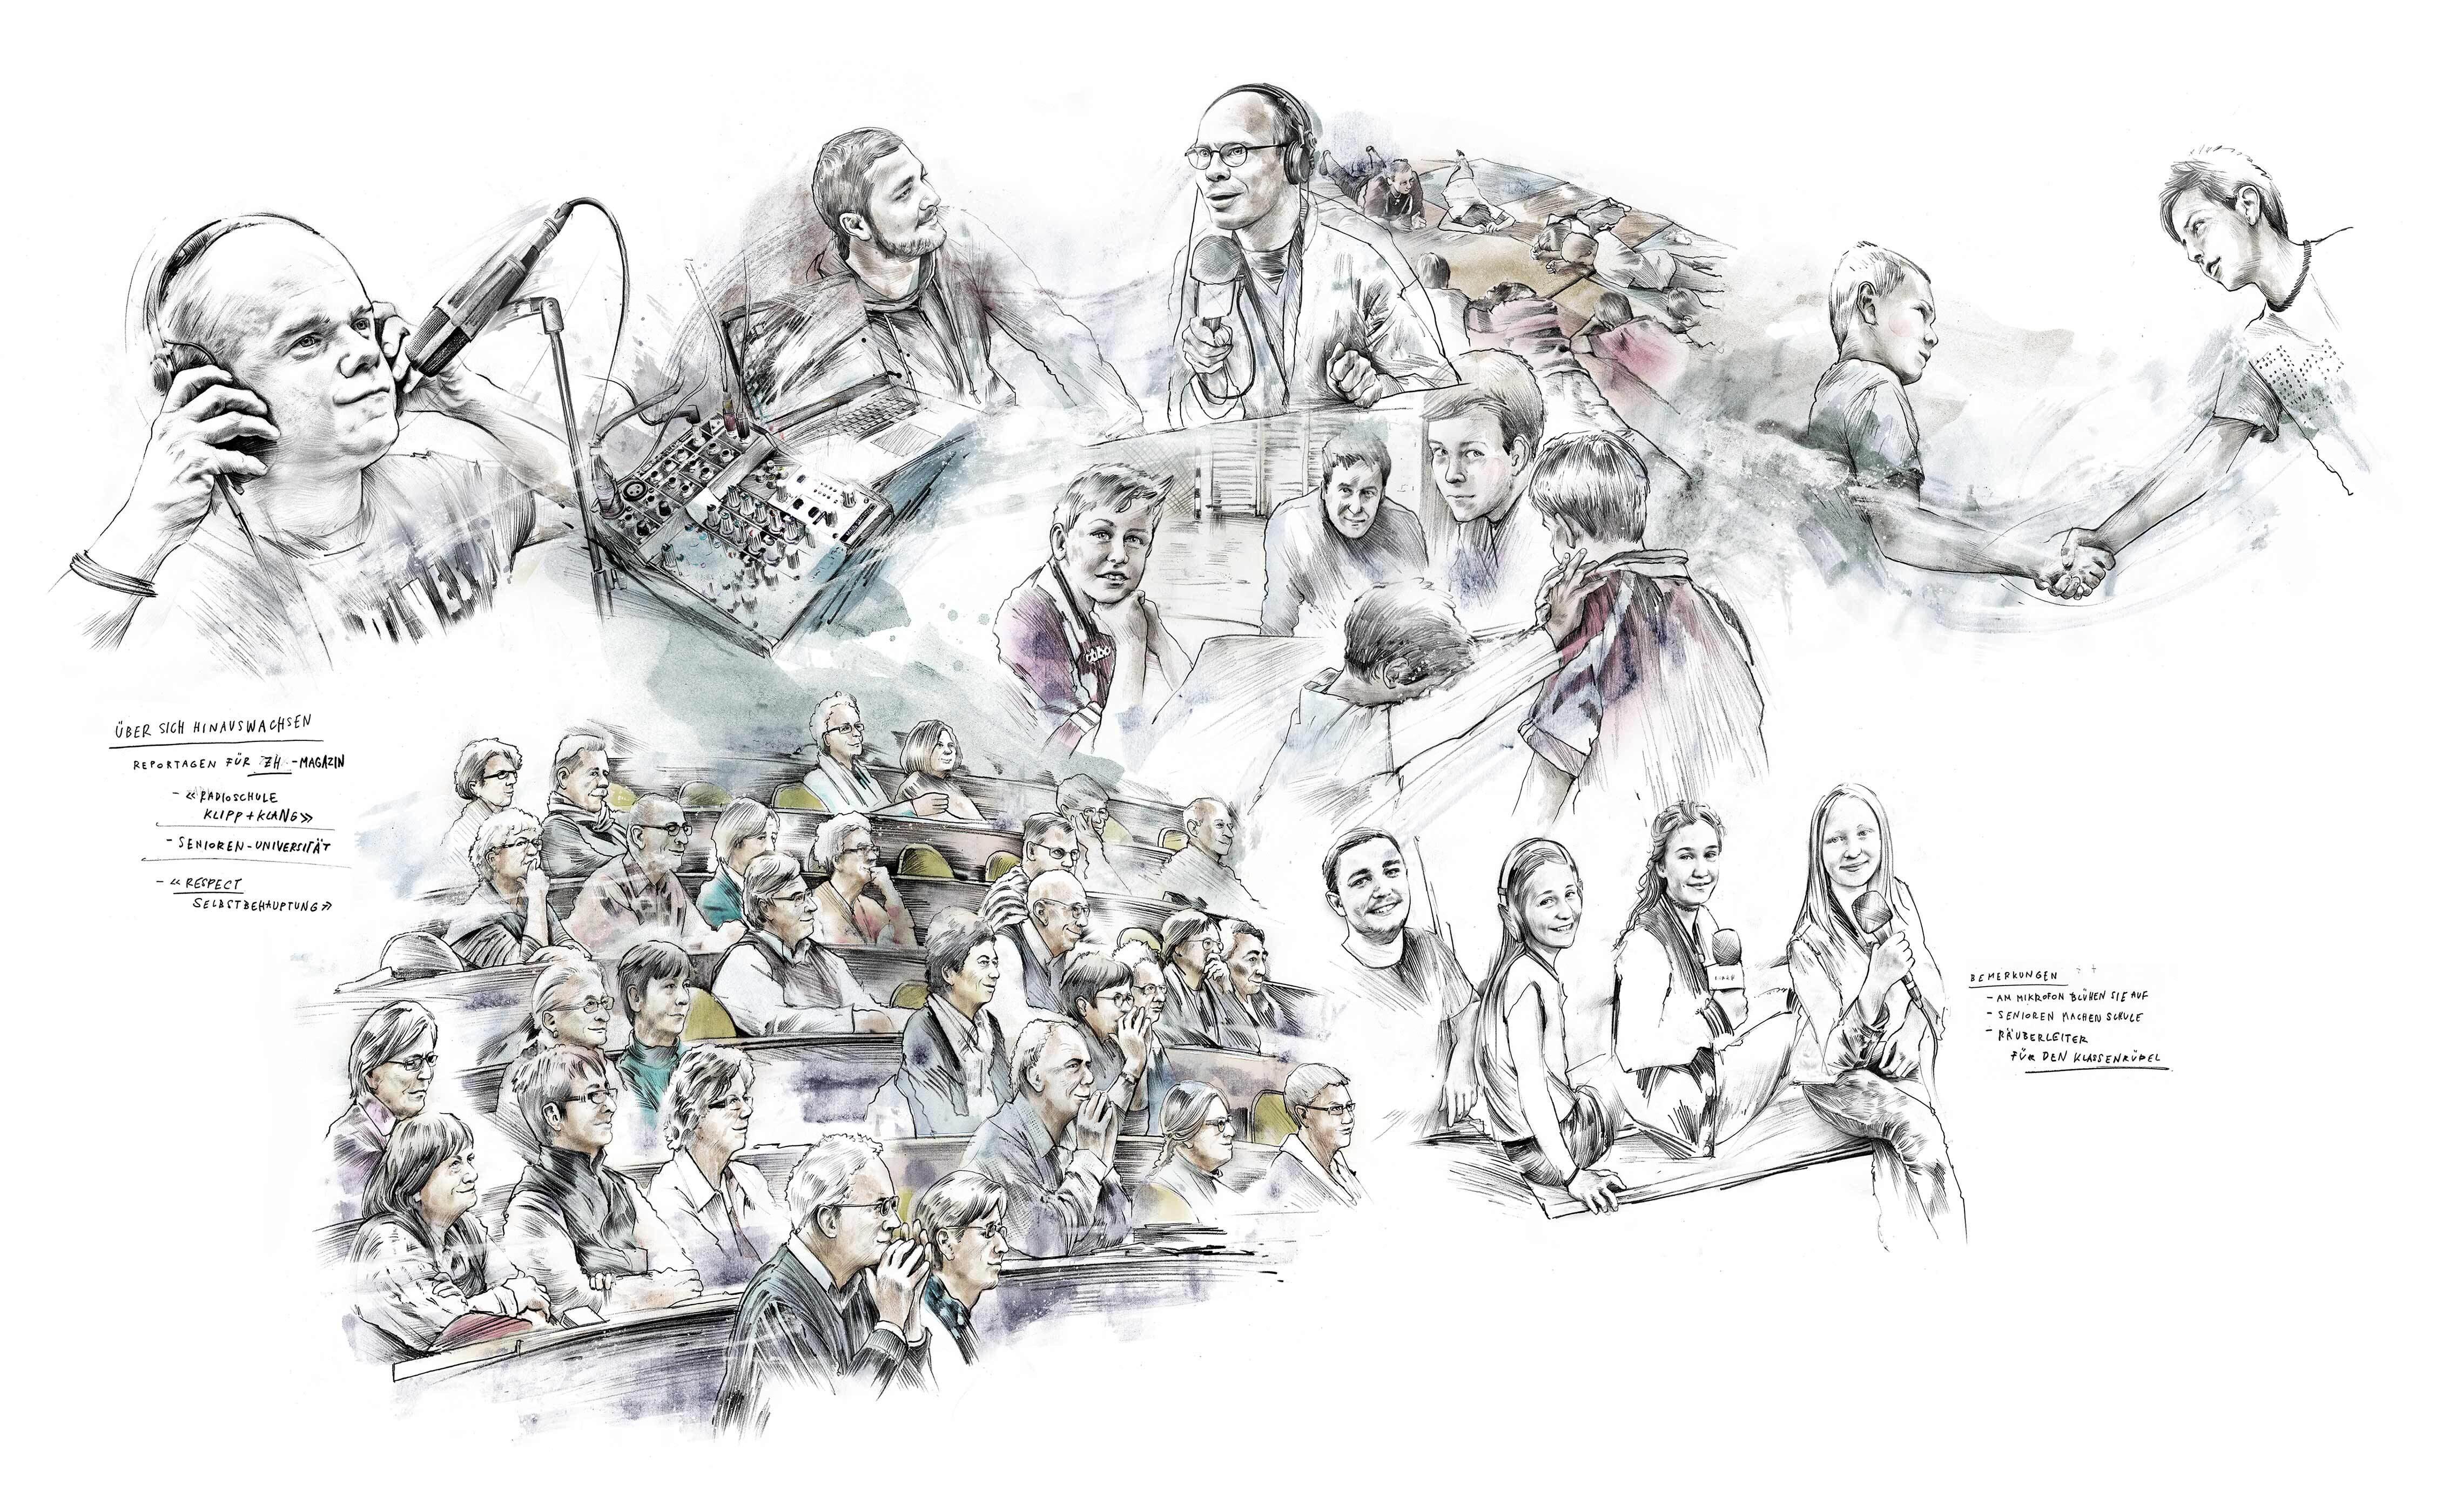 Reportage zeichnung skizze - Kornel Illustration   Kornel Stadler portfolio